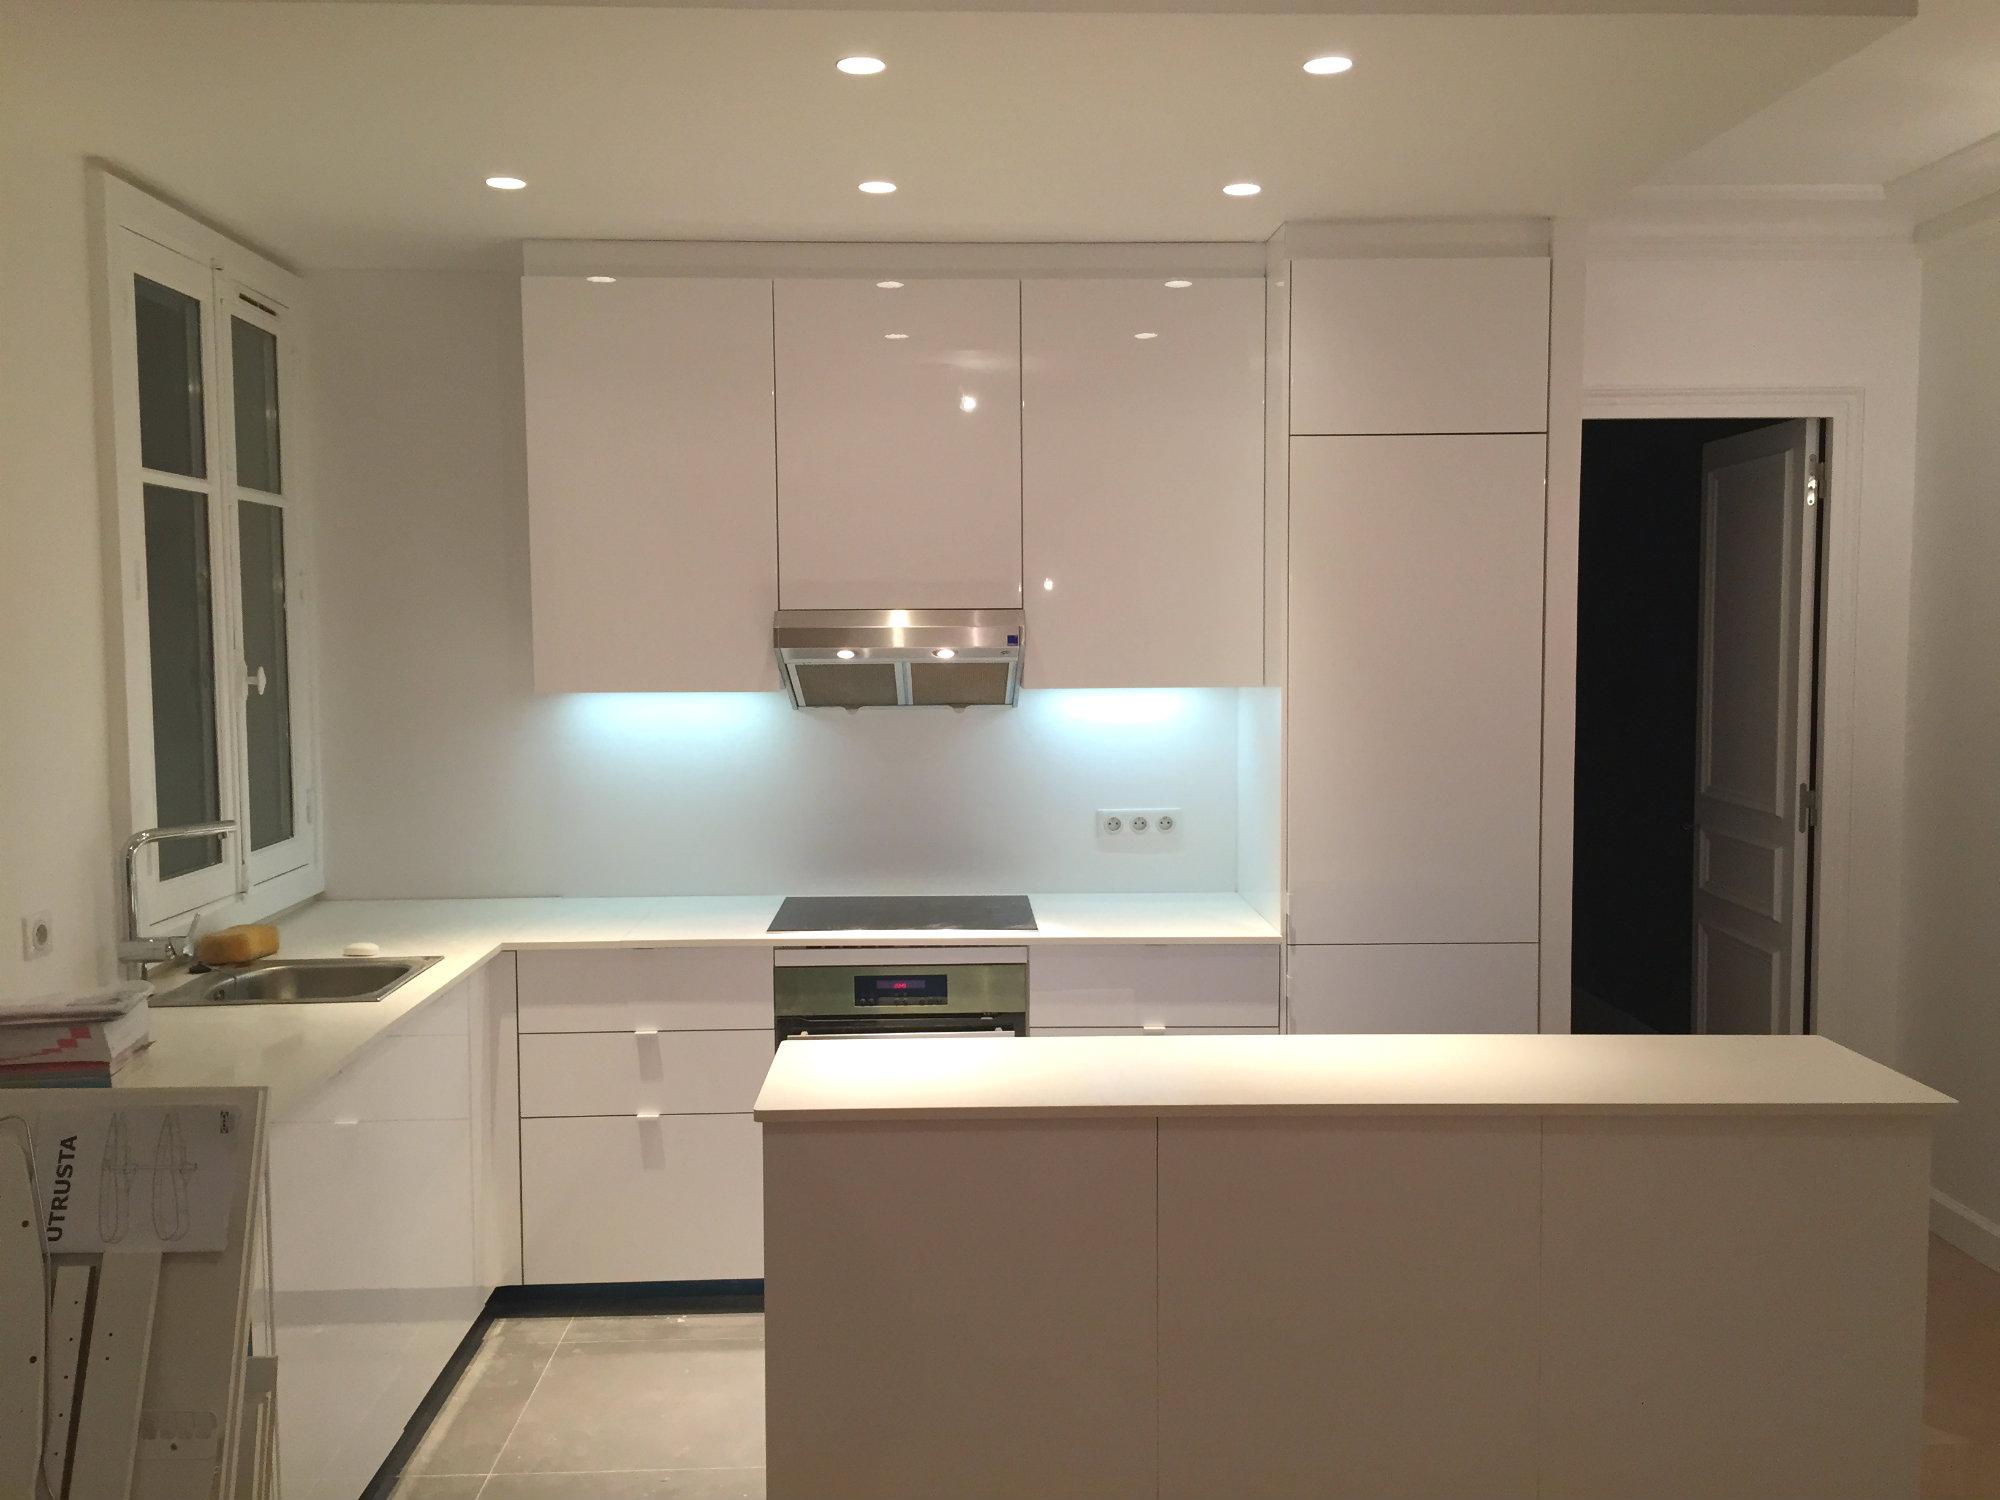 2016 travaux renovation appartement transformation F2 en F3 Paris rue Damremont_Eolh btp france 7